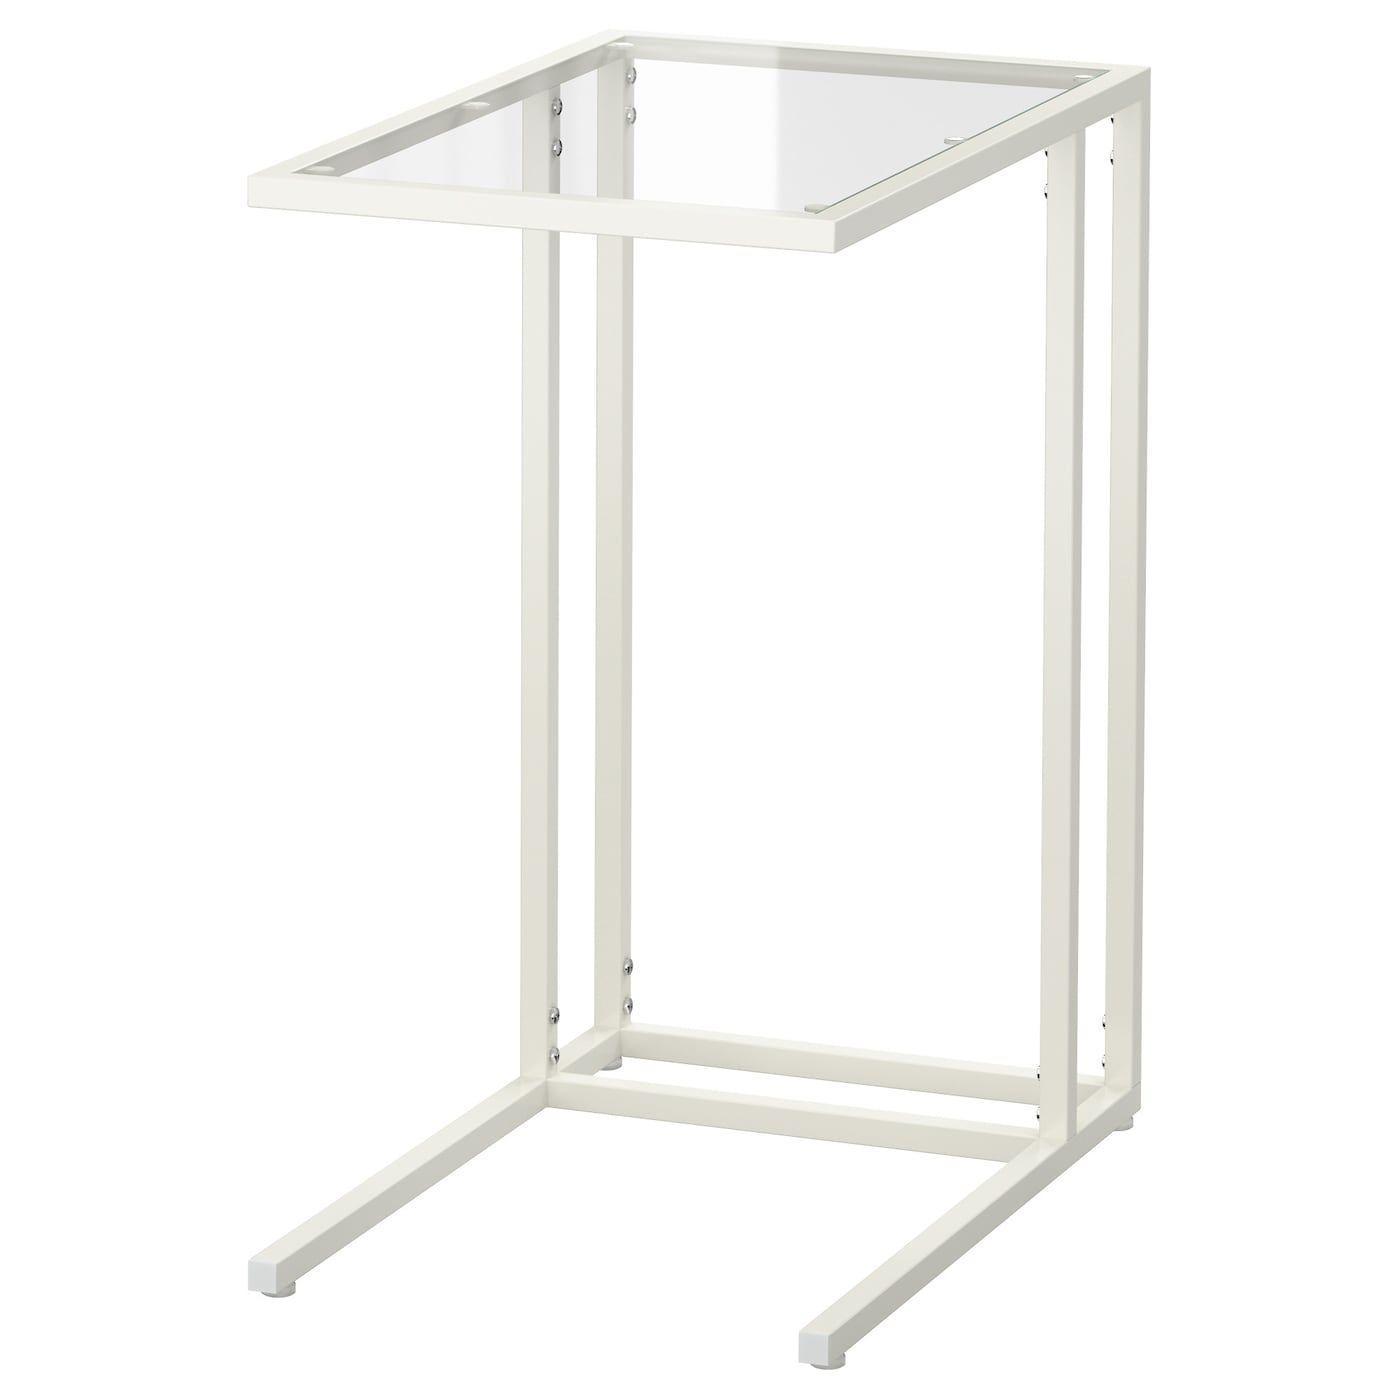 Vittsjo Support Pr Portable Blanc Verre 35x65 Cm Ikea White Glass Laptop Stand Ikea [ 1400 x 1400 Pixel ]